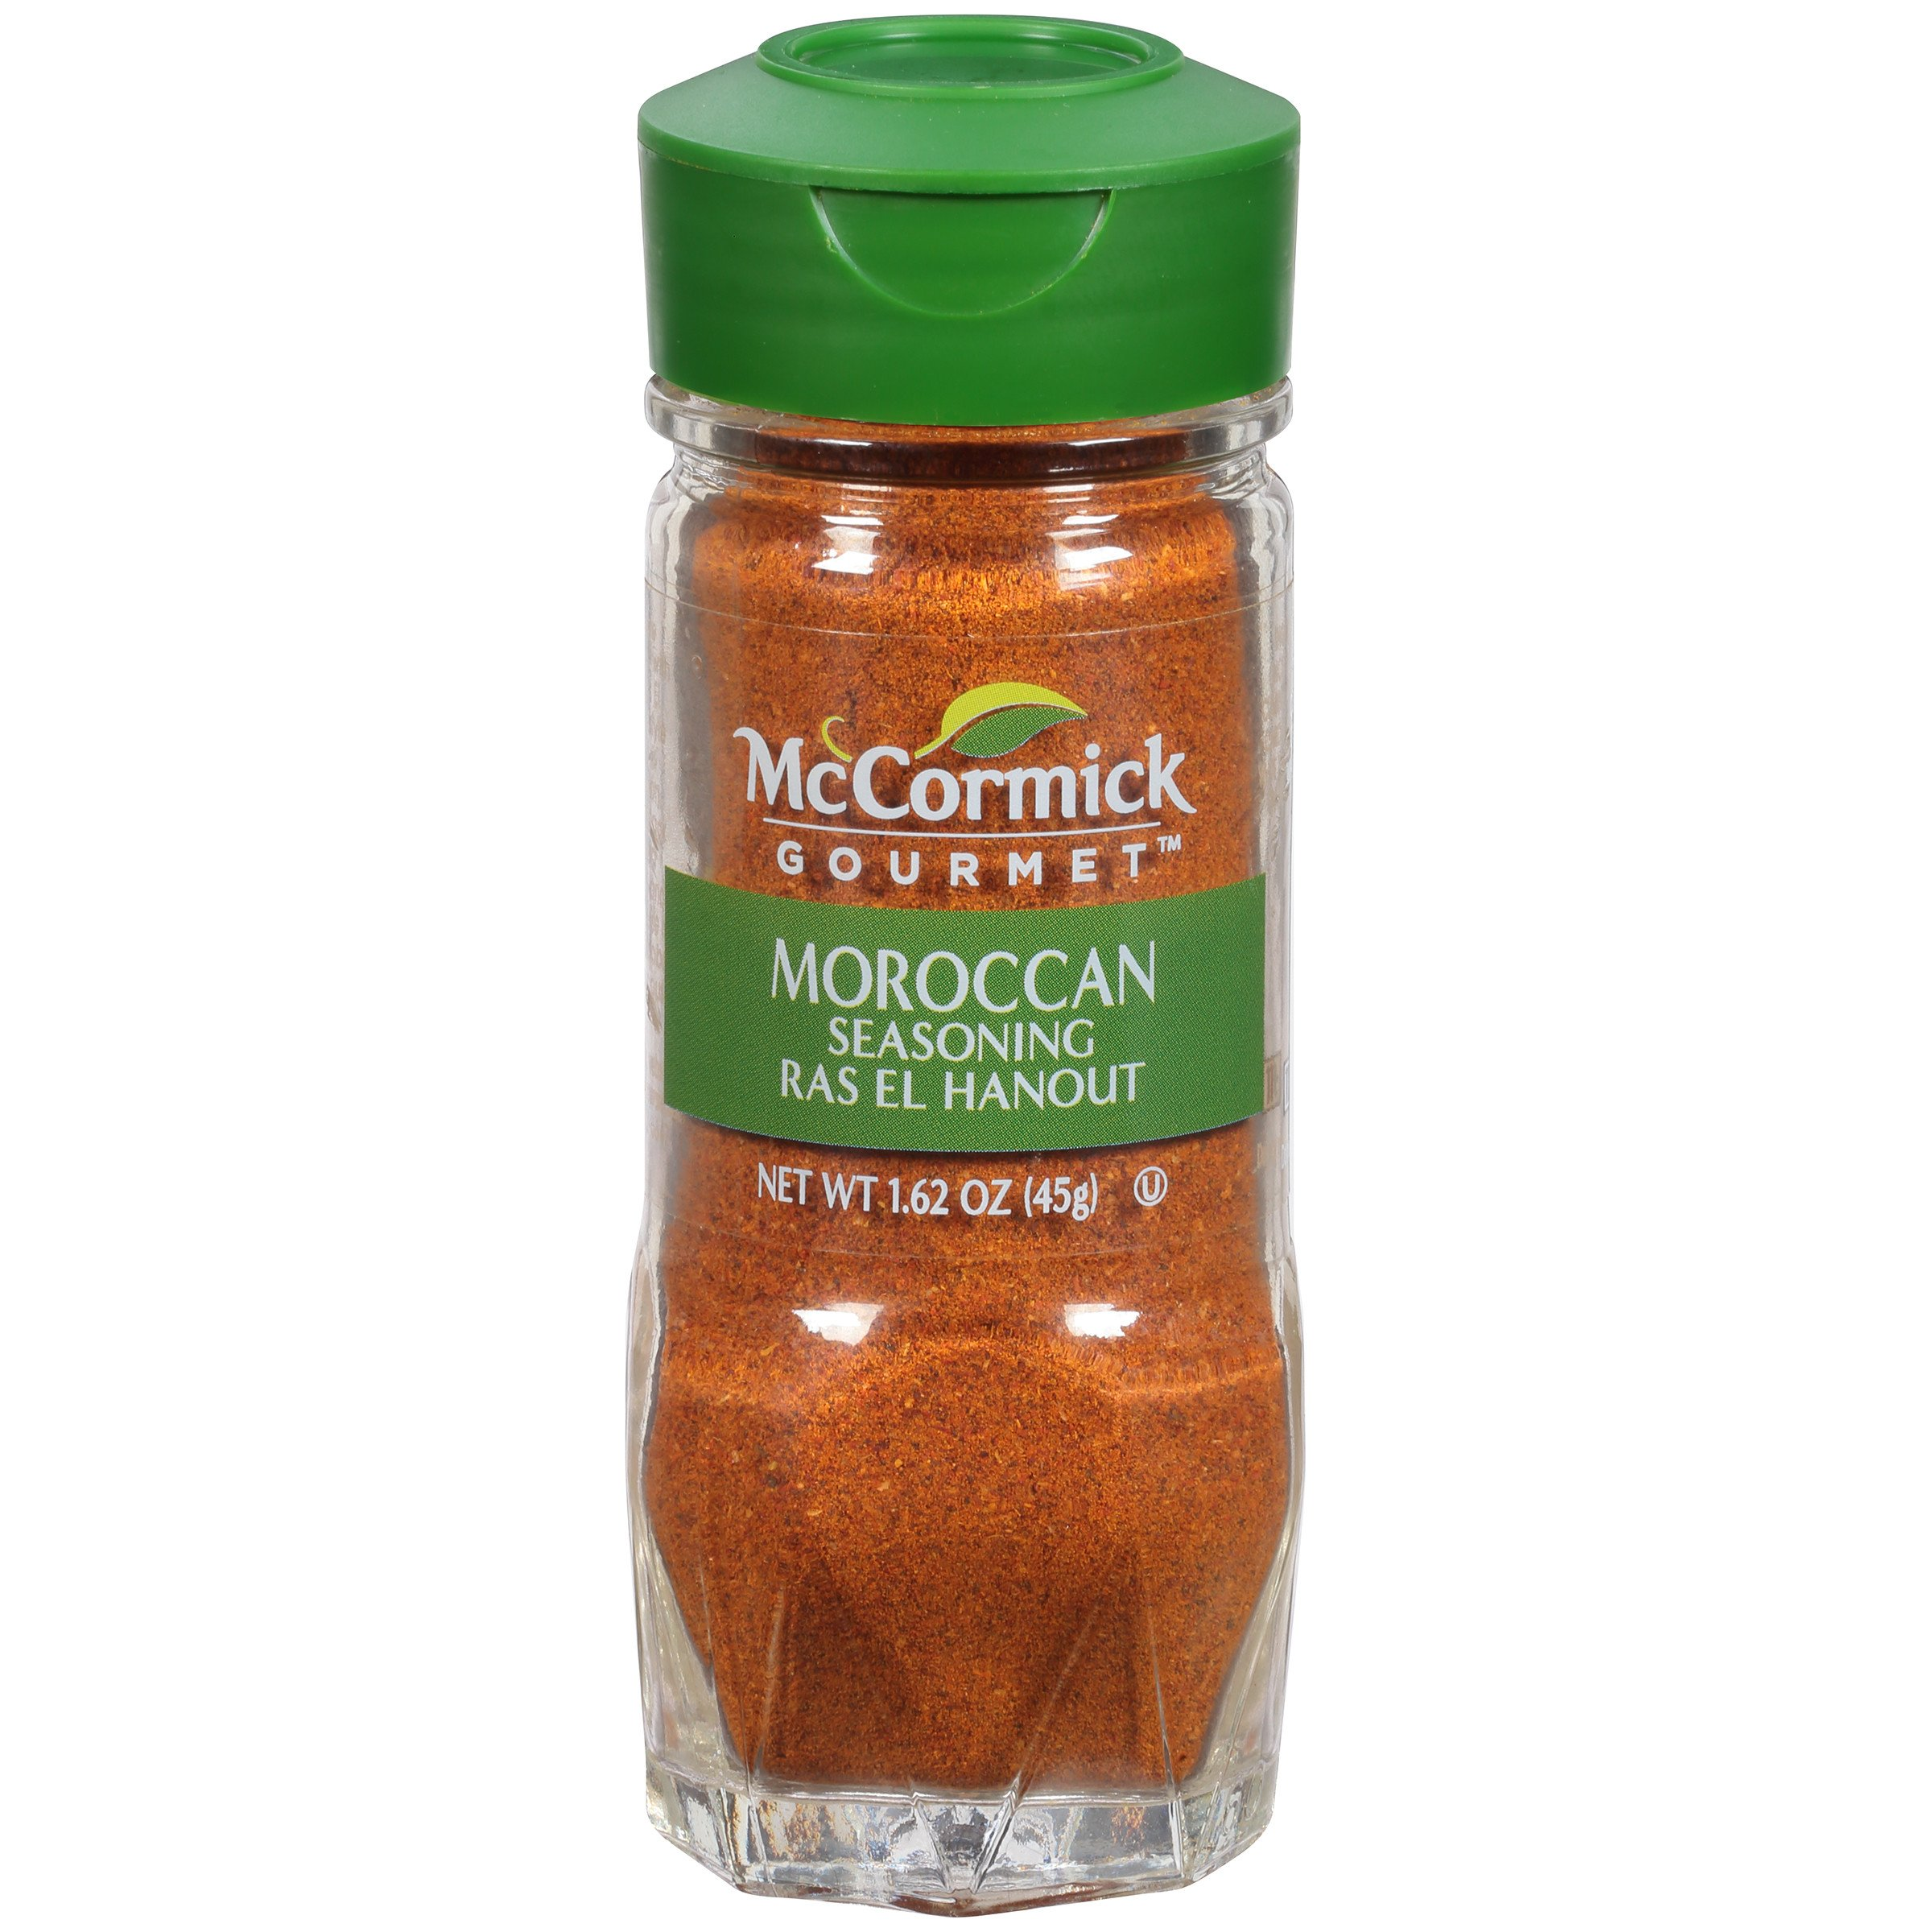 McCormick Gourmet Ras El Hanout Moroccan Seasoning, 1.62 oz